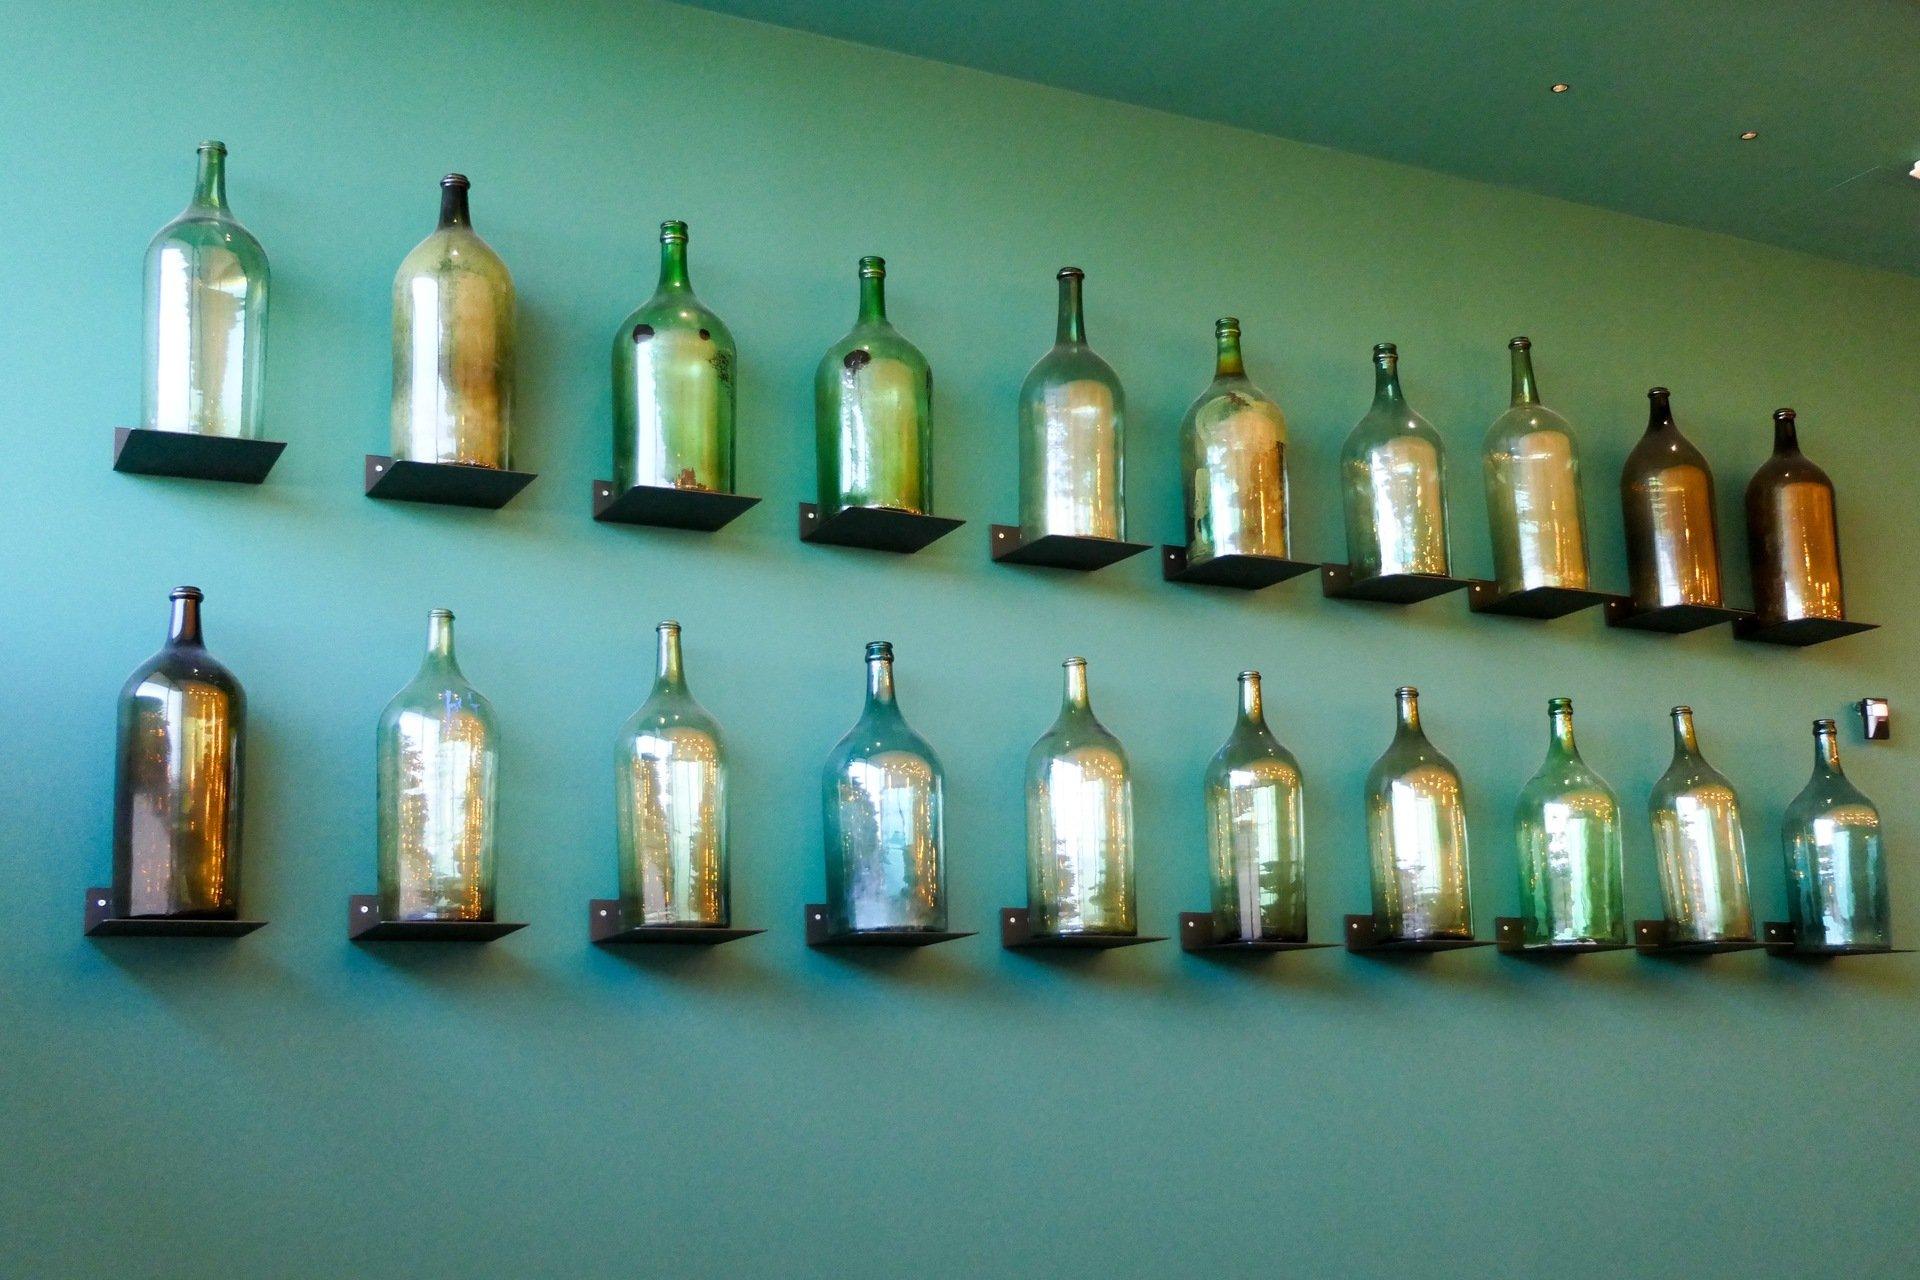 bottiglie appese a muro verde